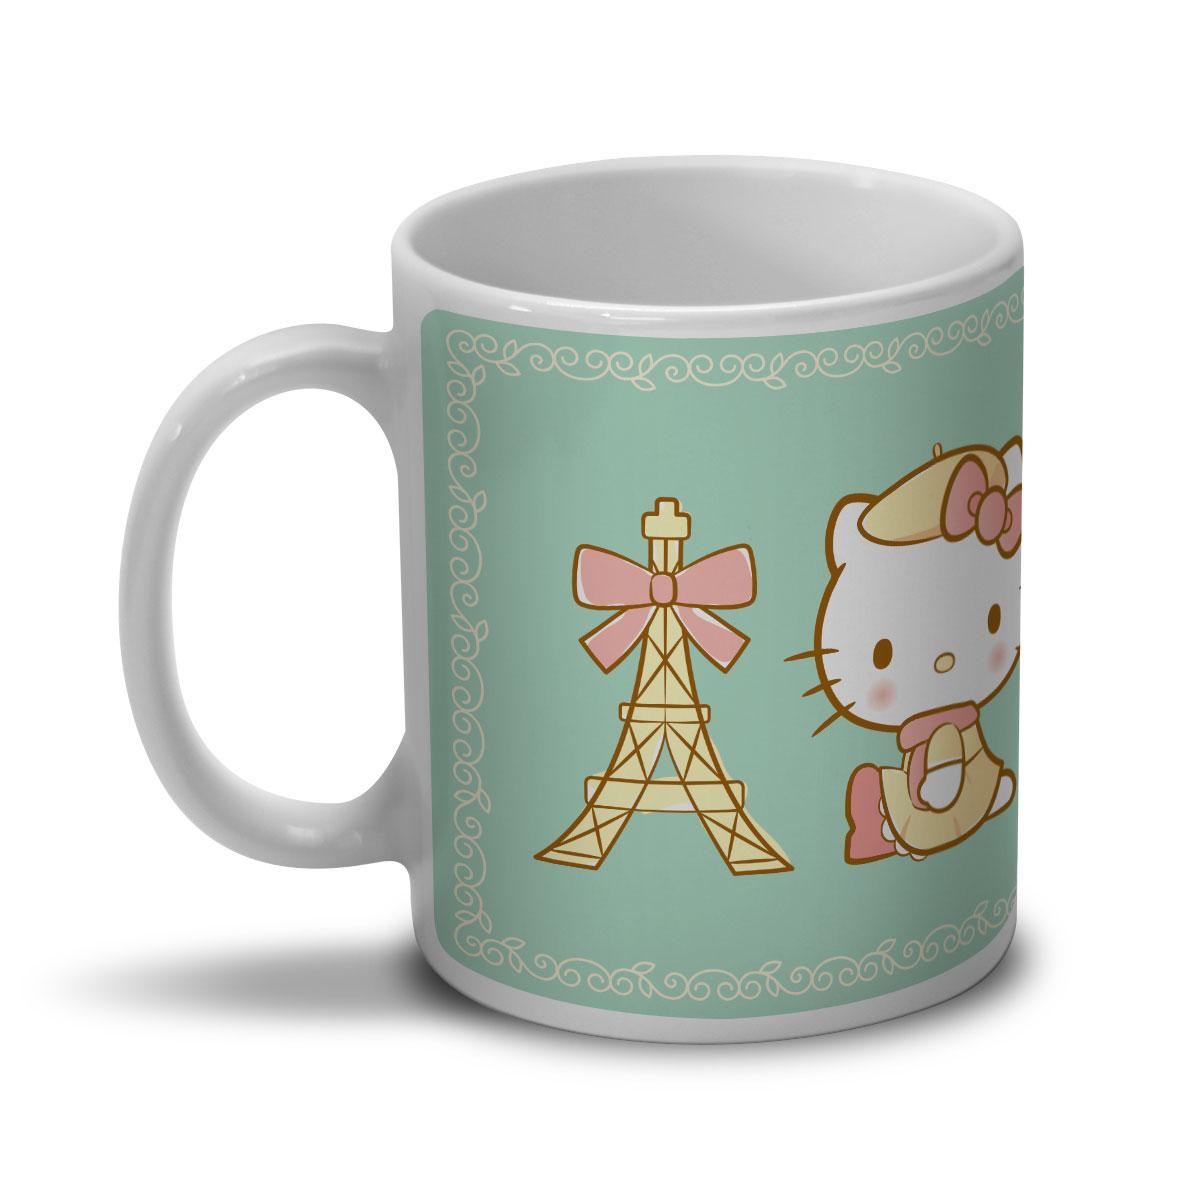 Caneca Hello Kitty Un Petit Cadeau de Paris